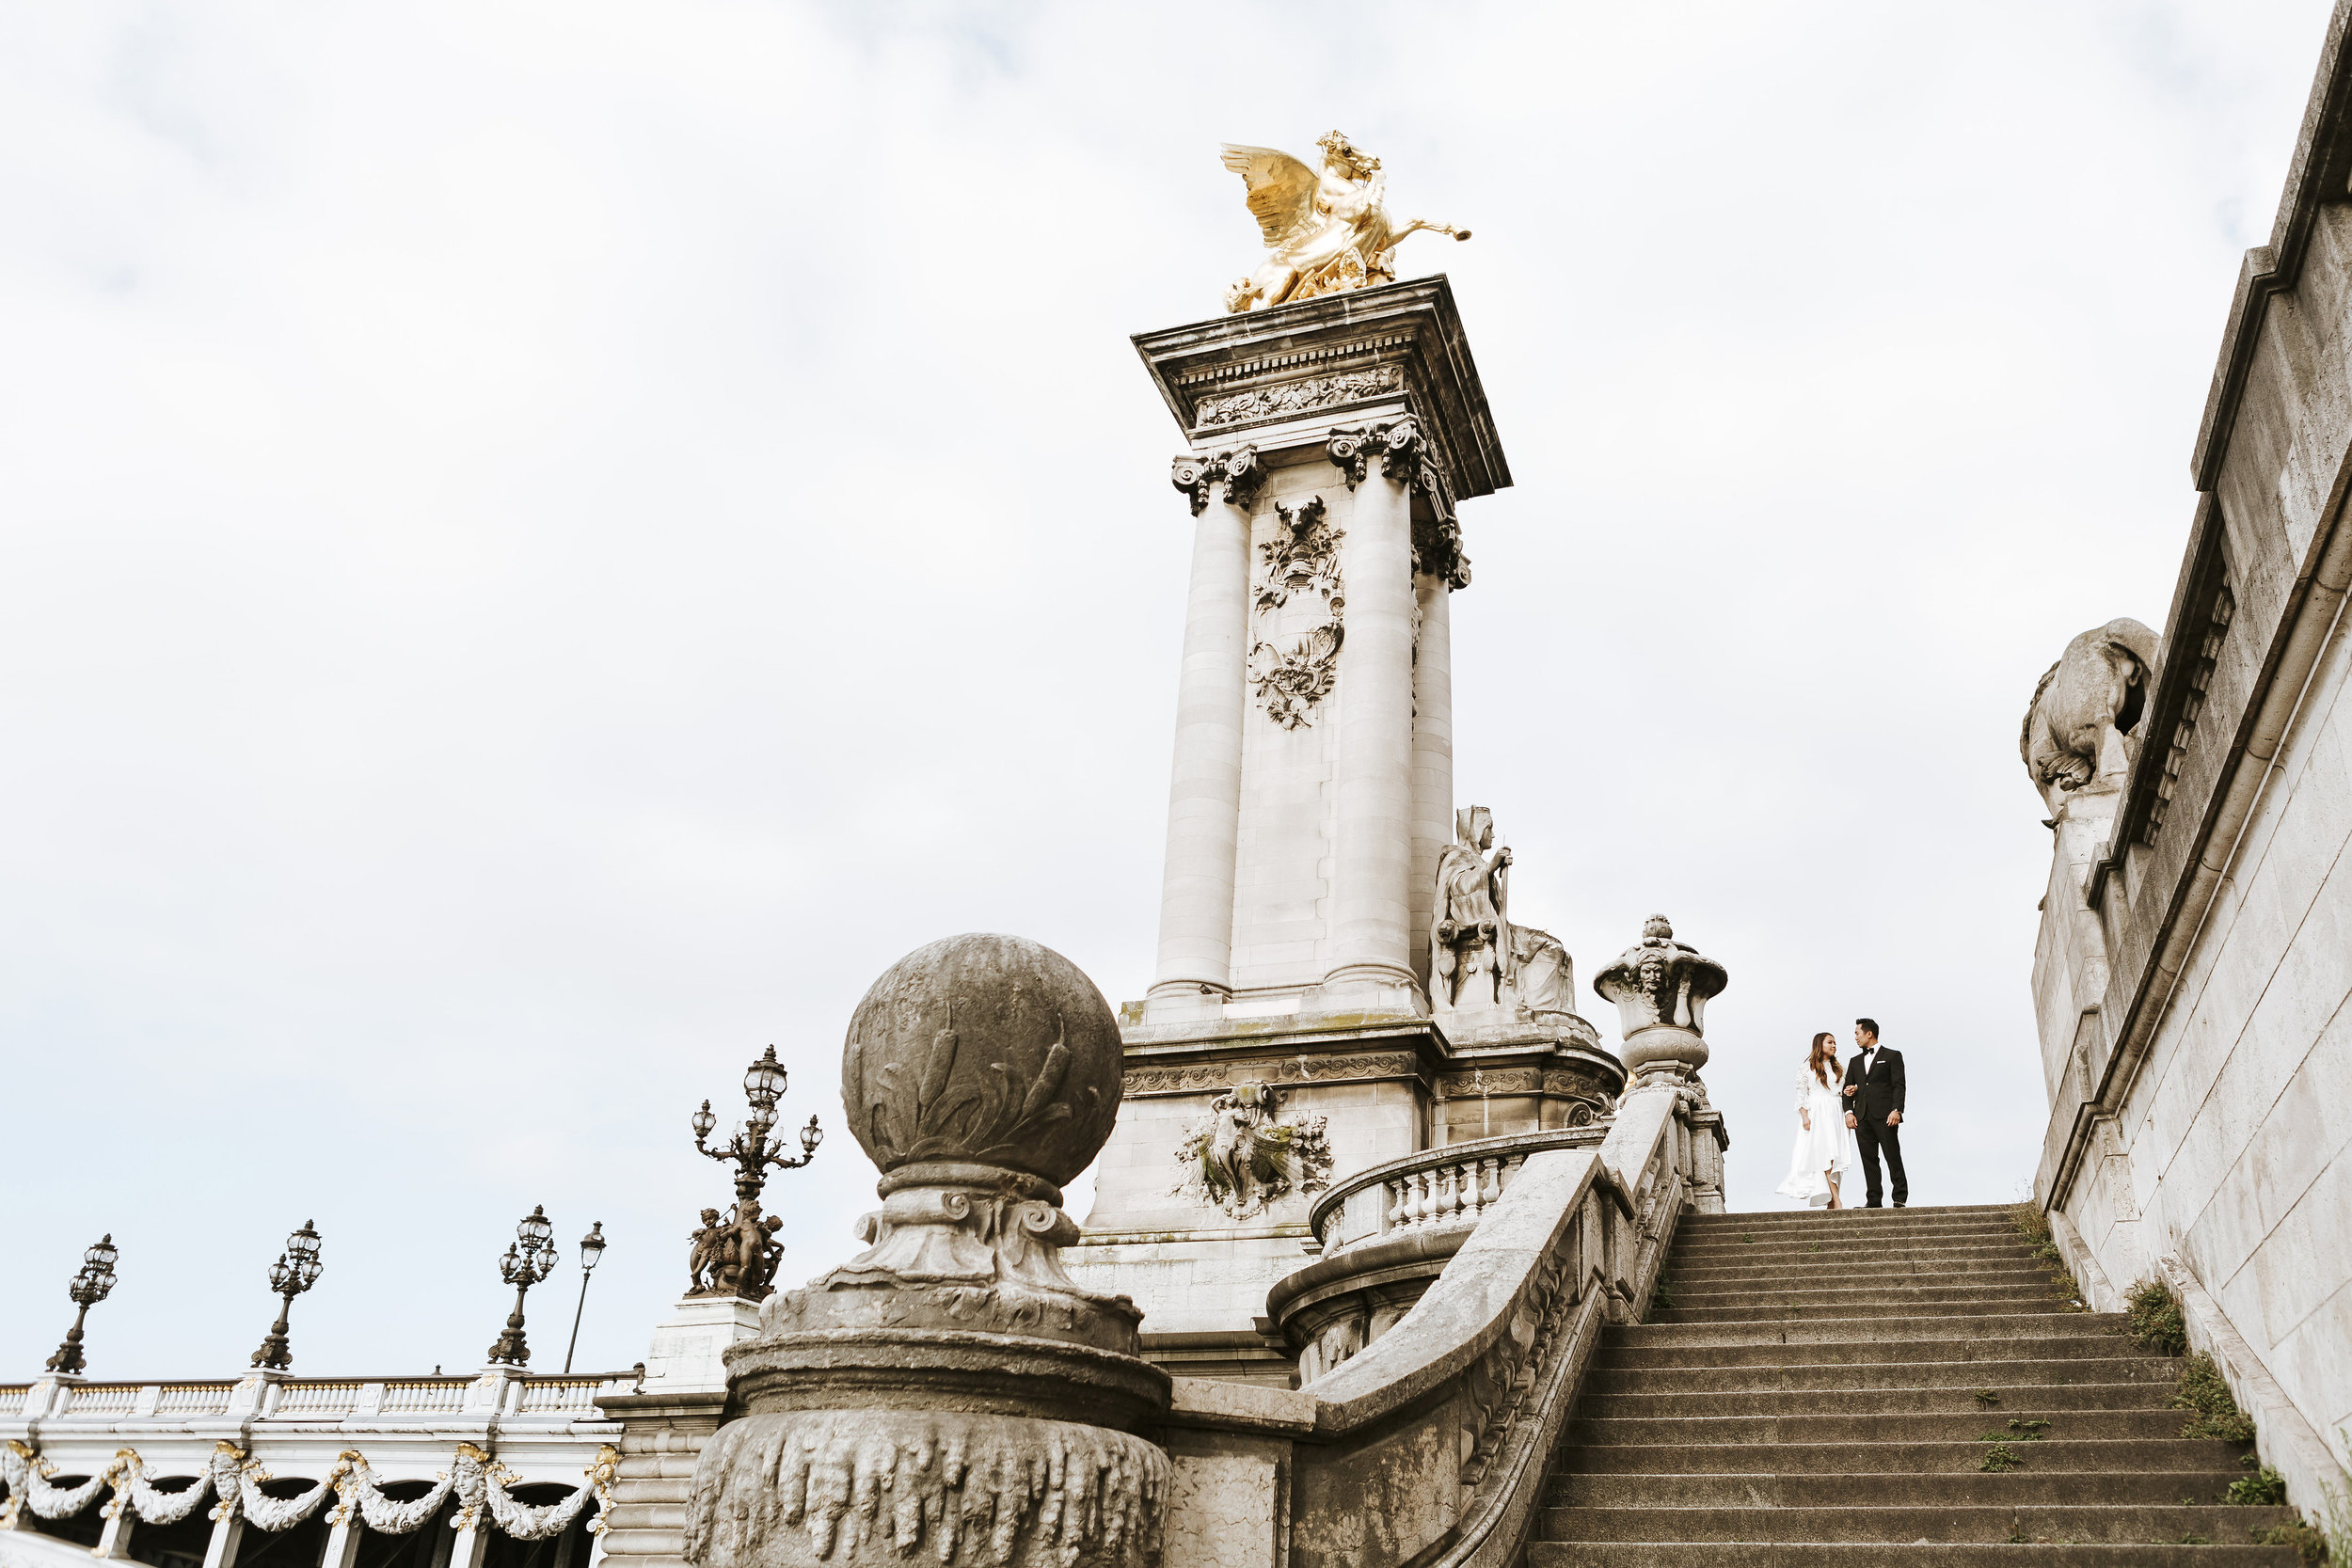 paris photographer federico guendel wedding session portrait on alexandre III bridge